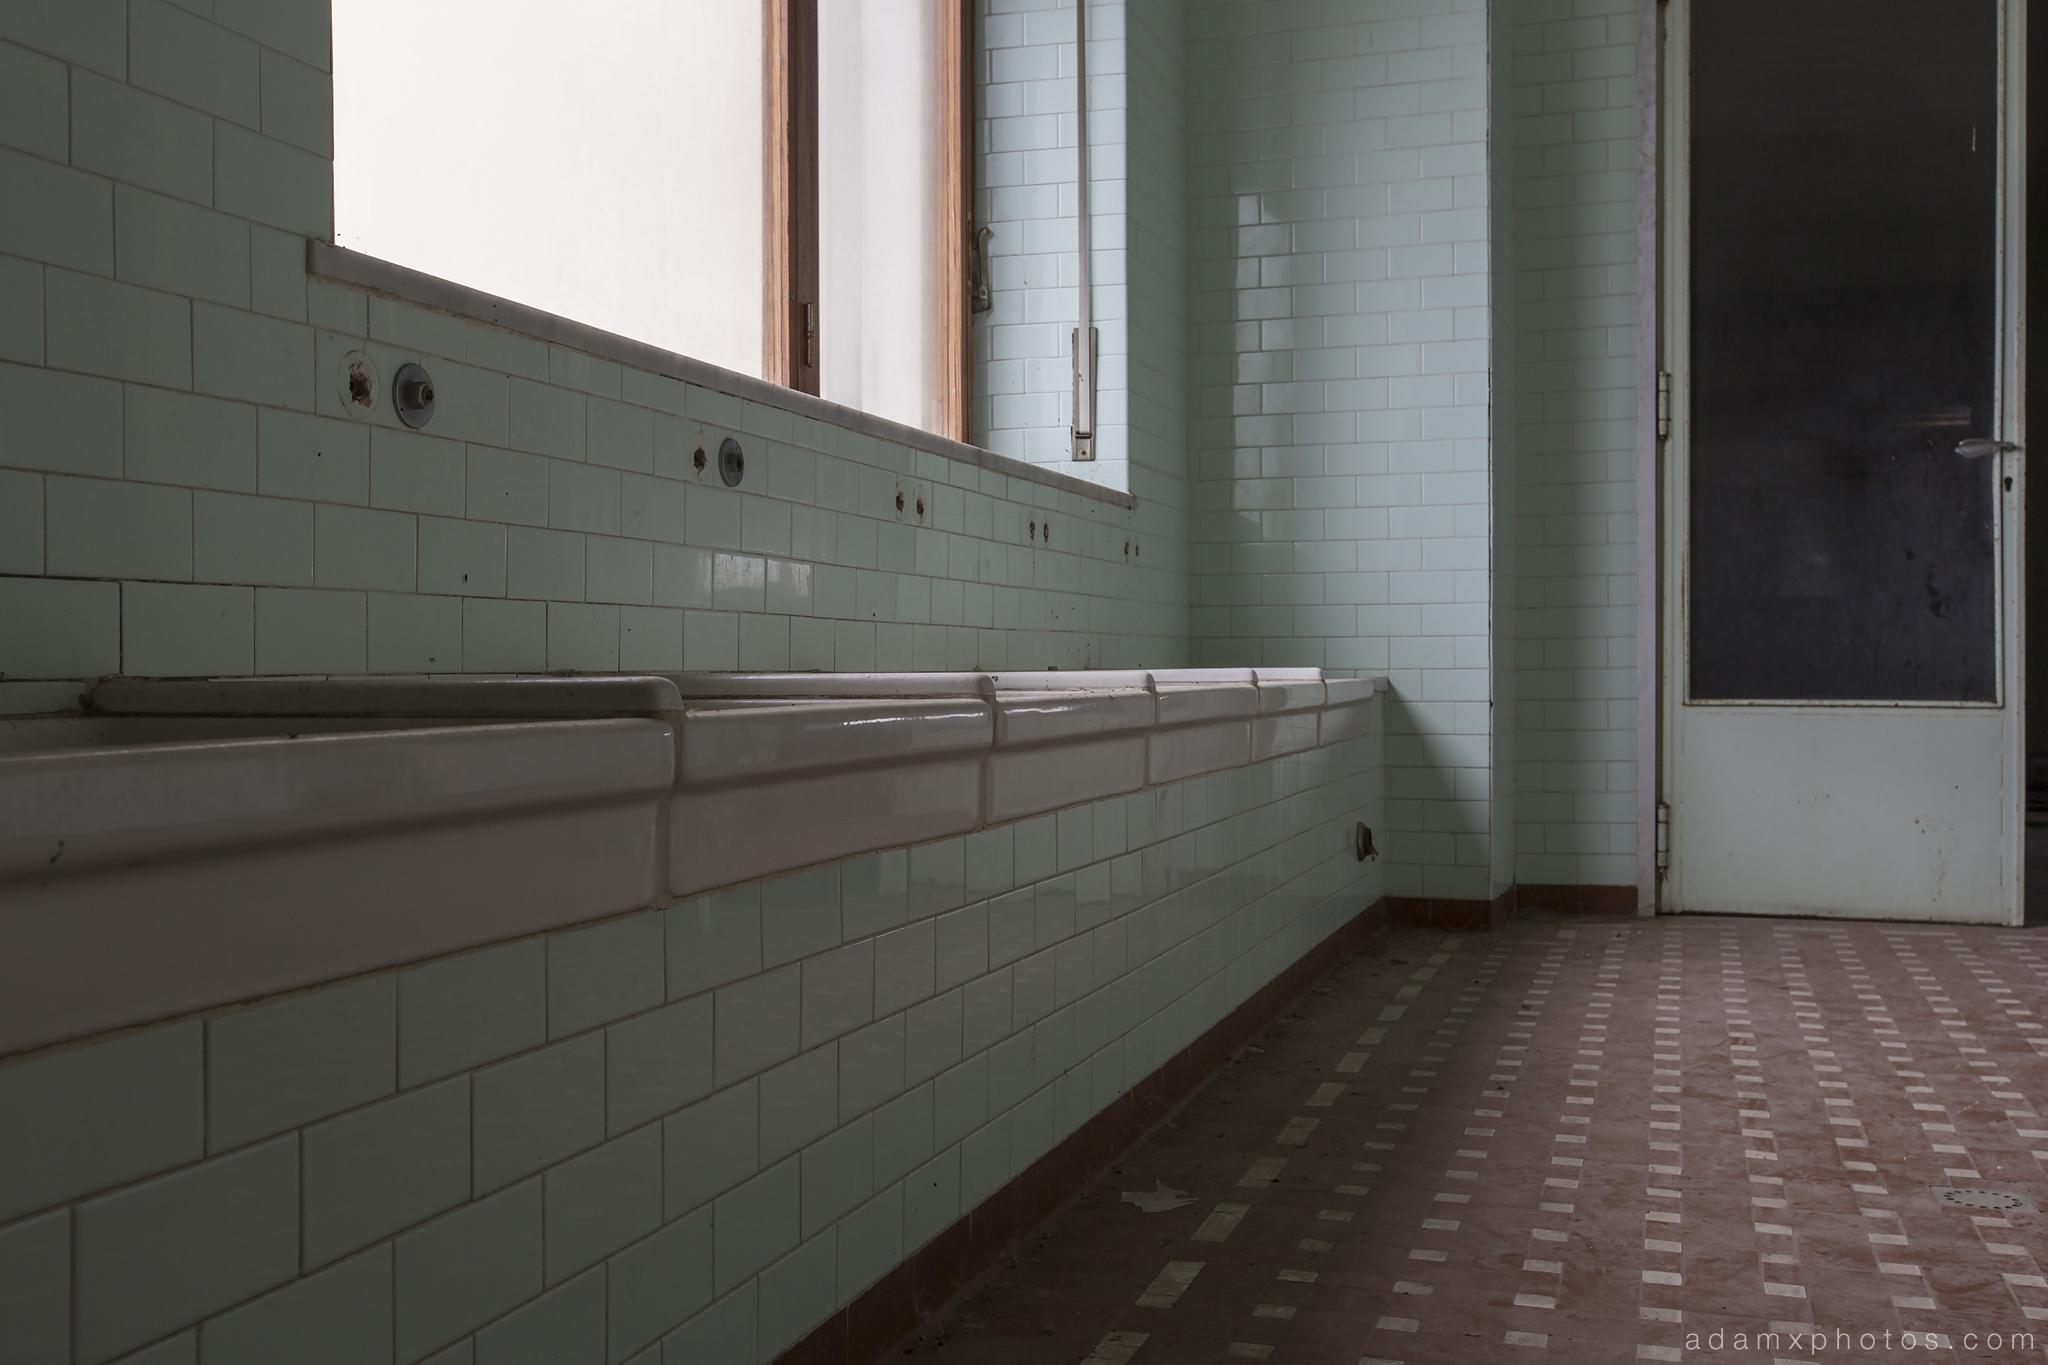 College Eglise Collegio di Musica Saint Evelise School Italy Italia bathroom tiles Urbex Adam X Urban Exploration photo photos report decay detail UE abandoned derelict unused empty disused decay decayed decaying grimy grime